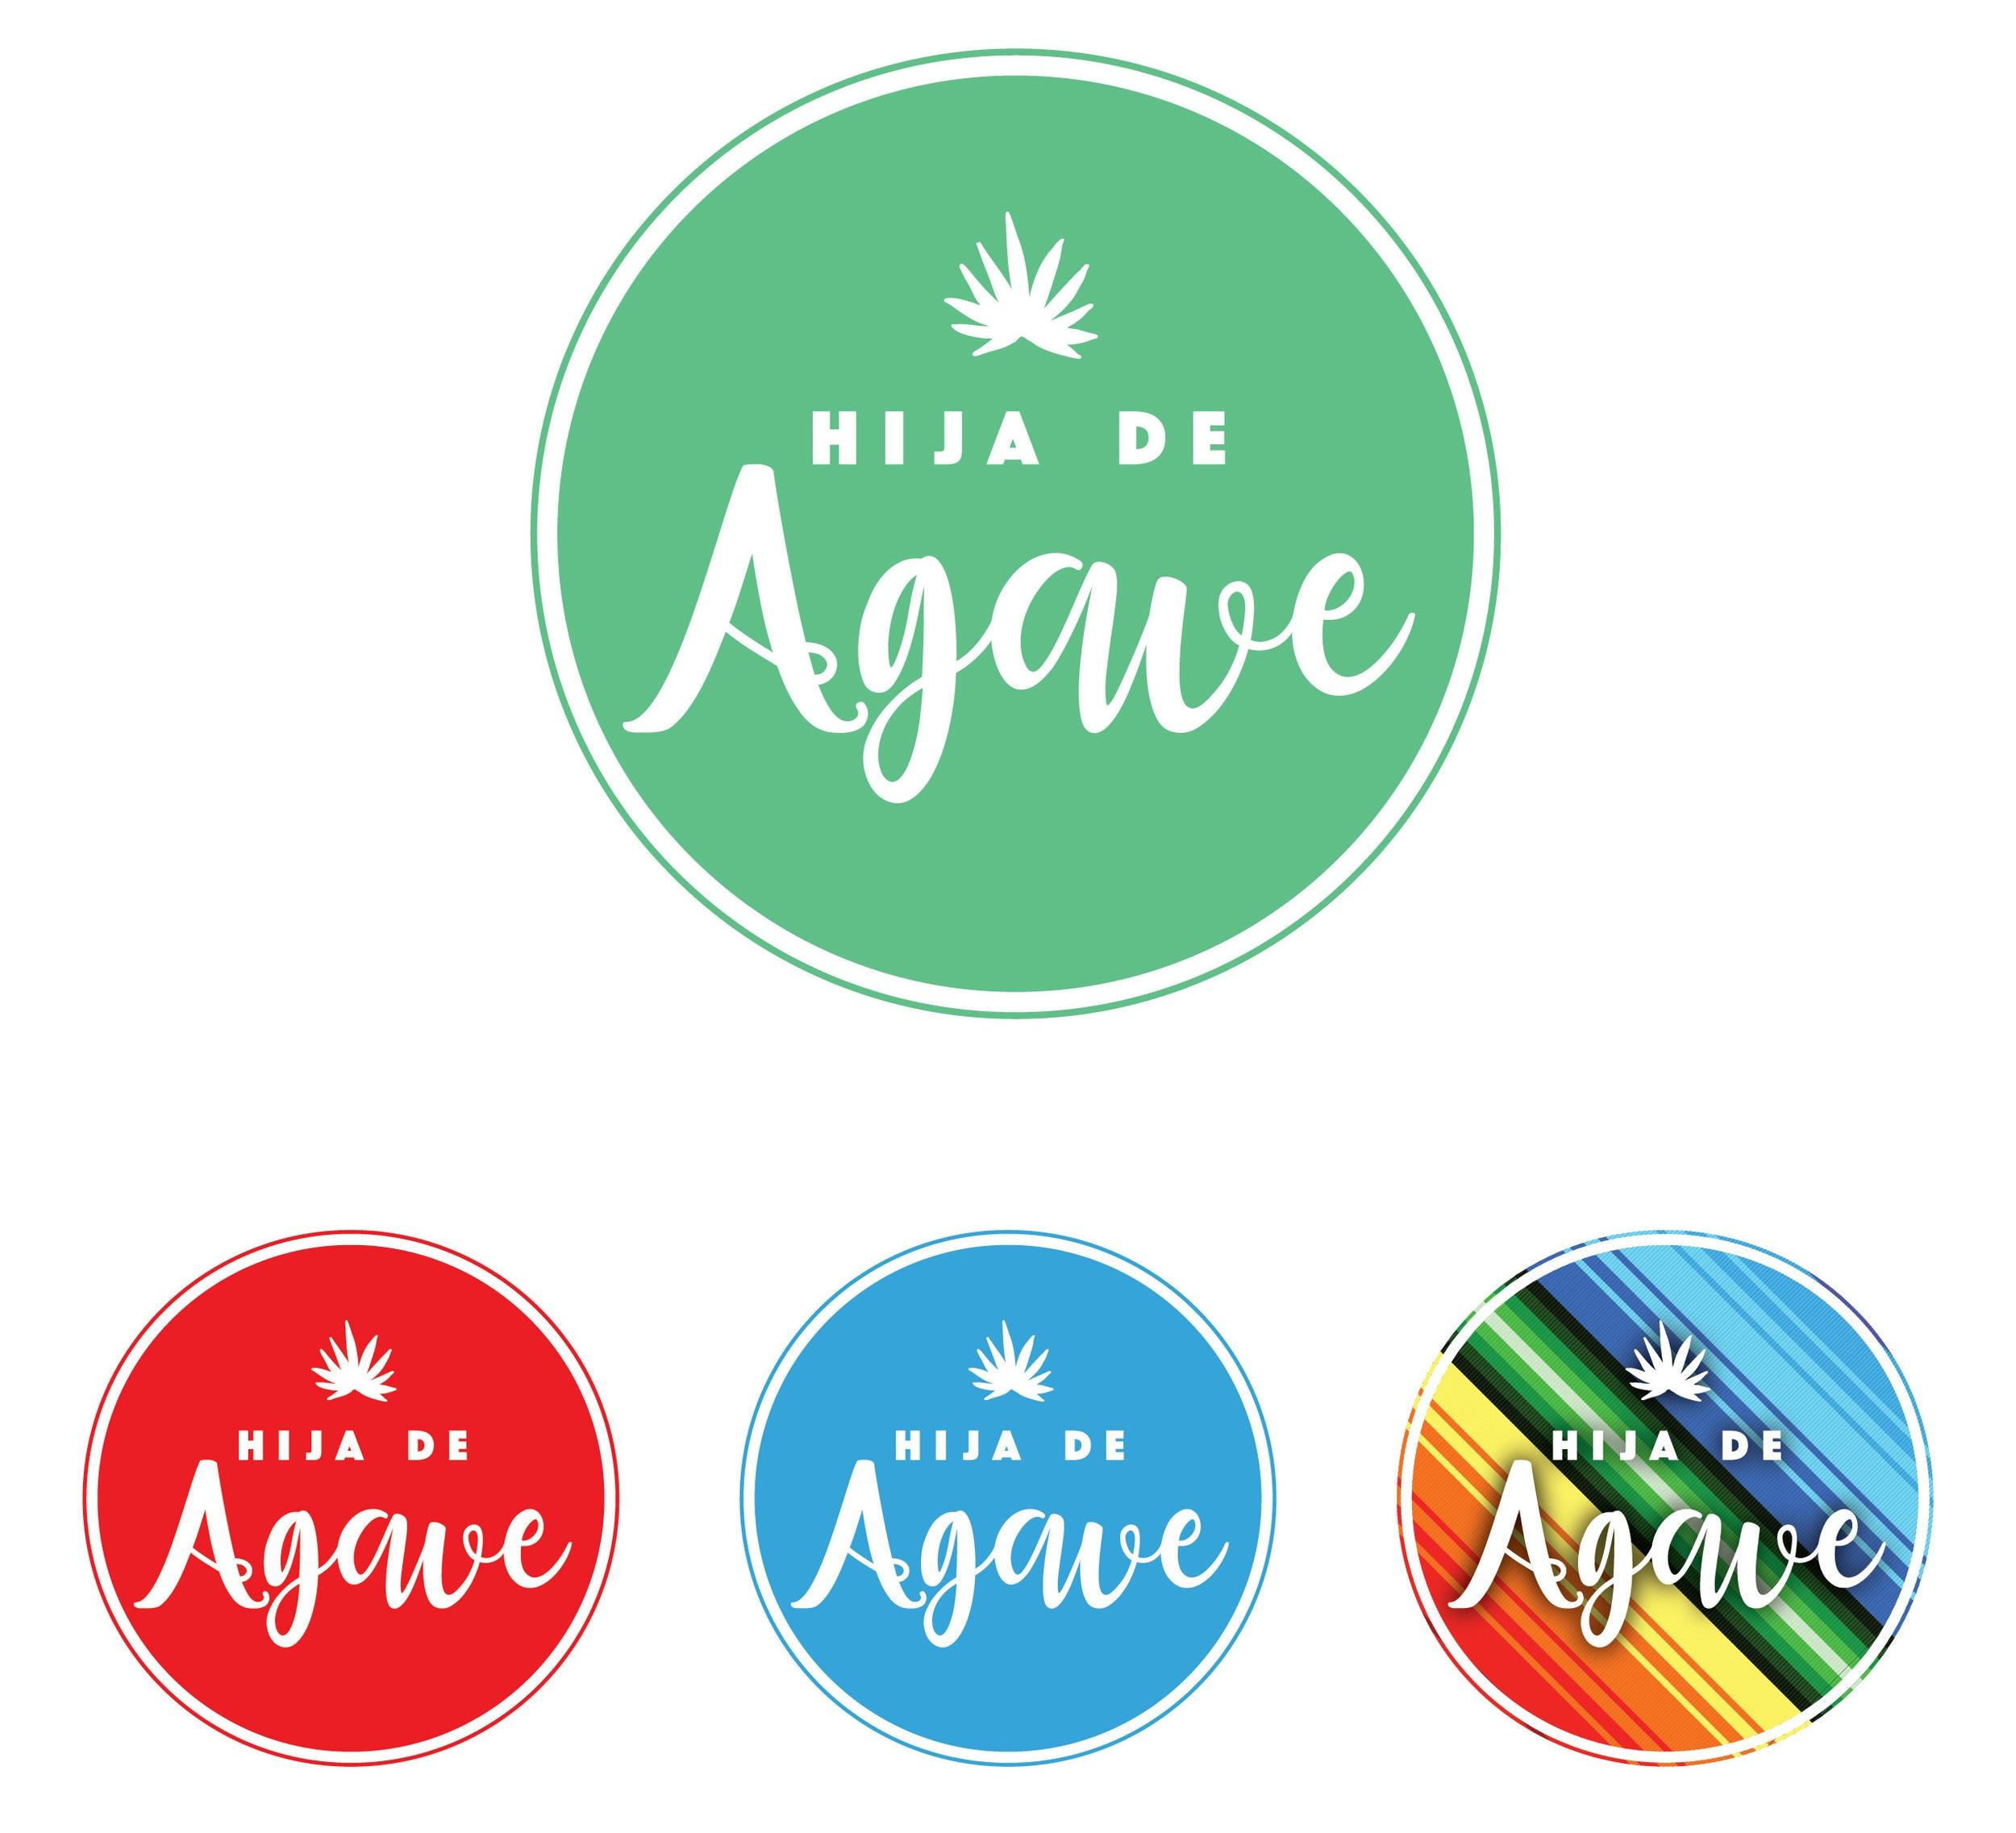 Agave-logos-01.jpg